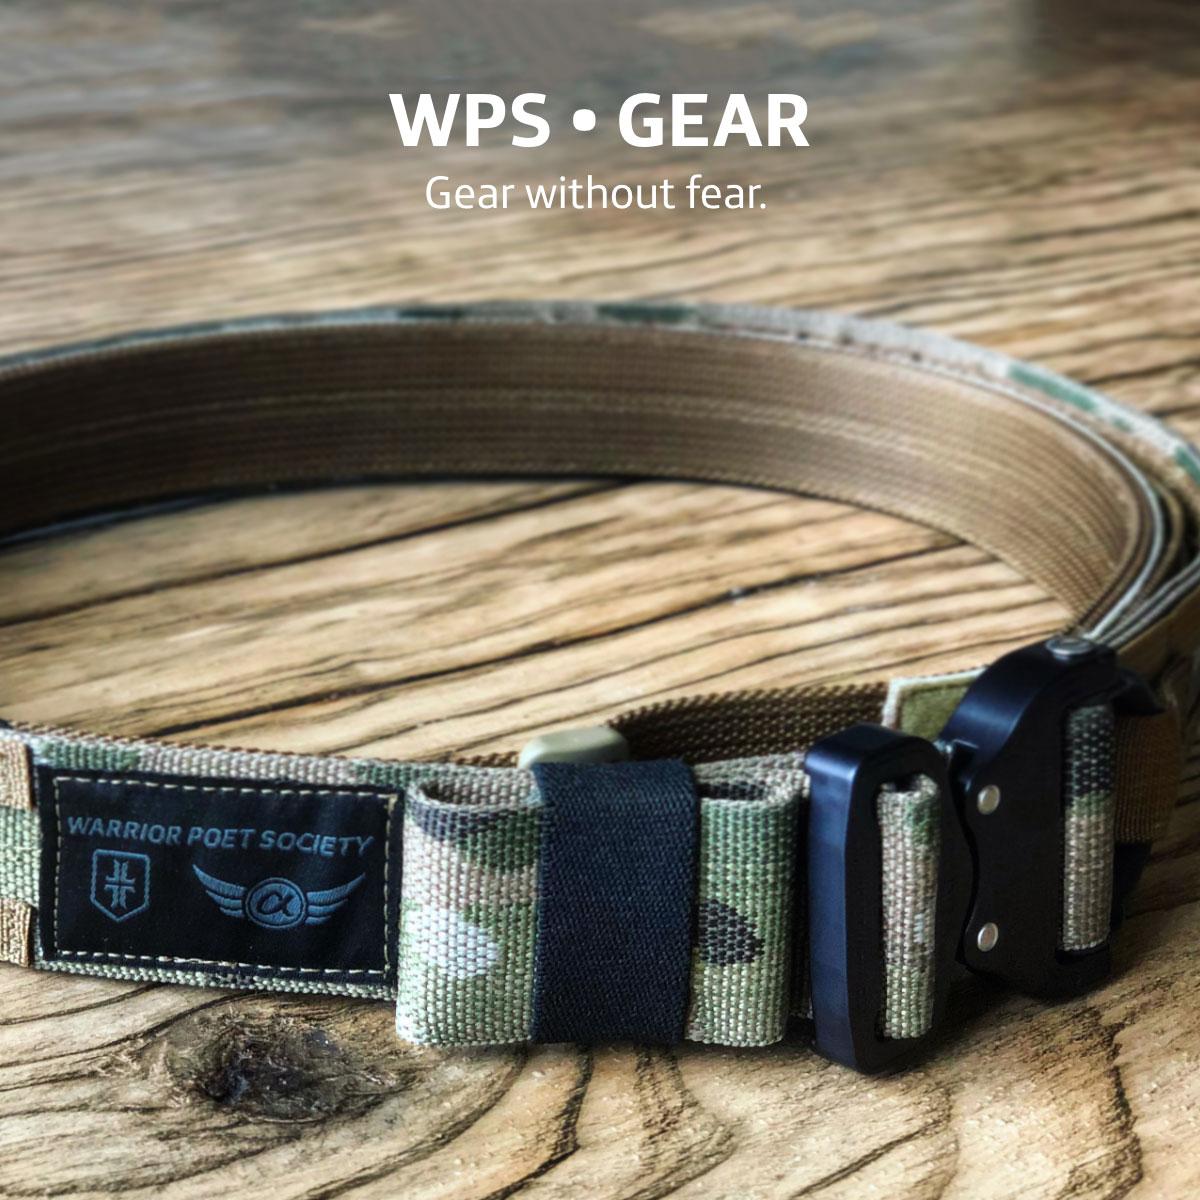 Warrior Poet Society Original Gear